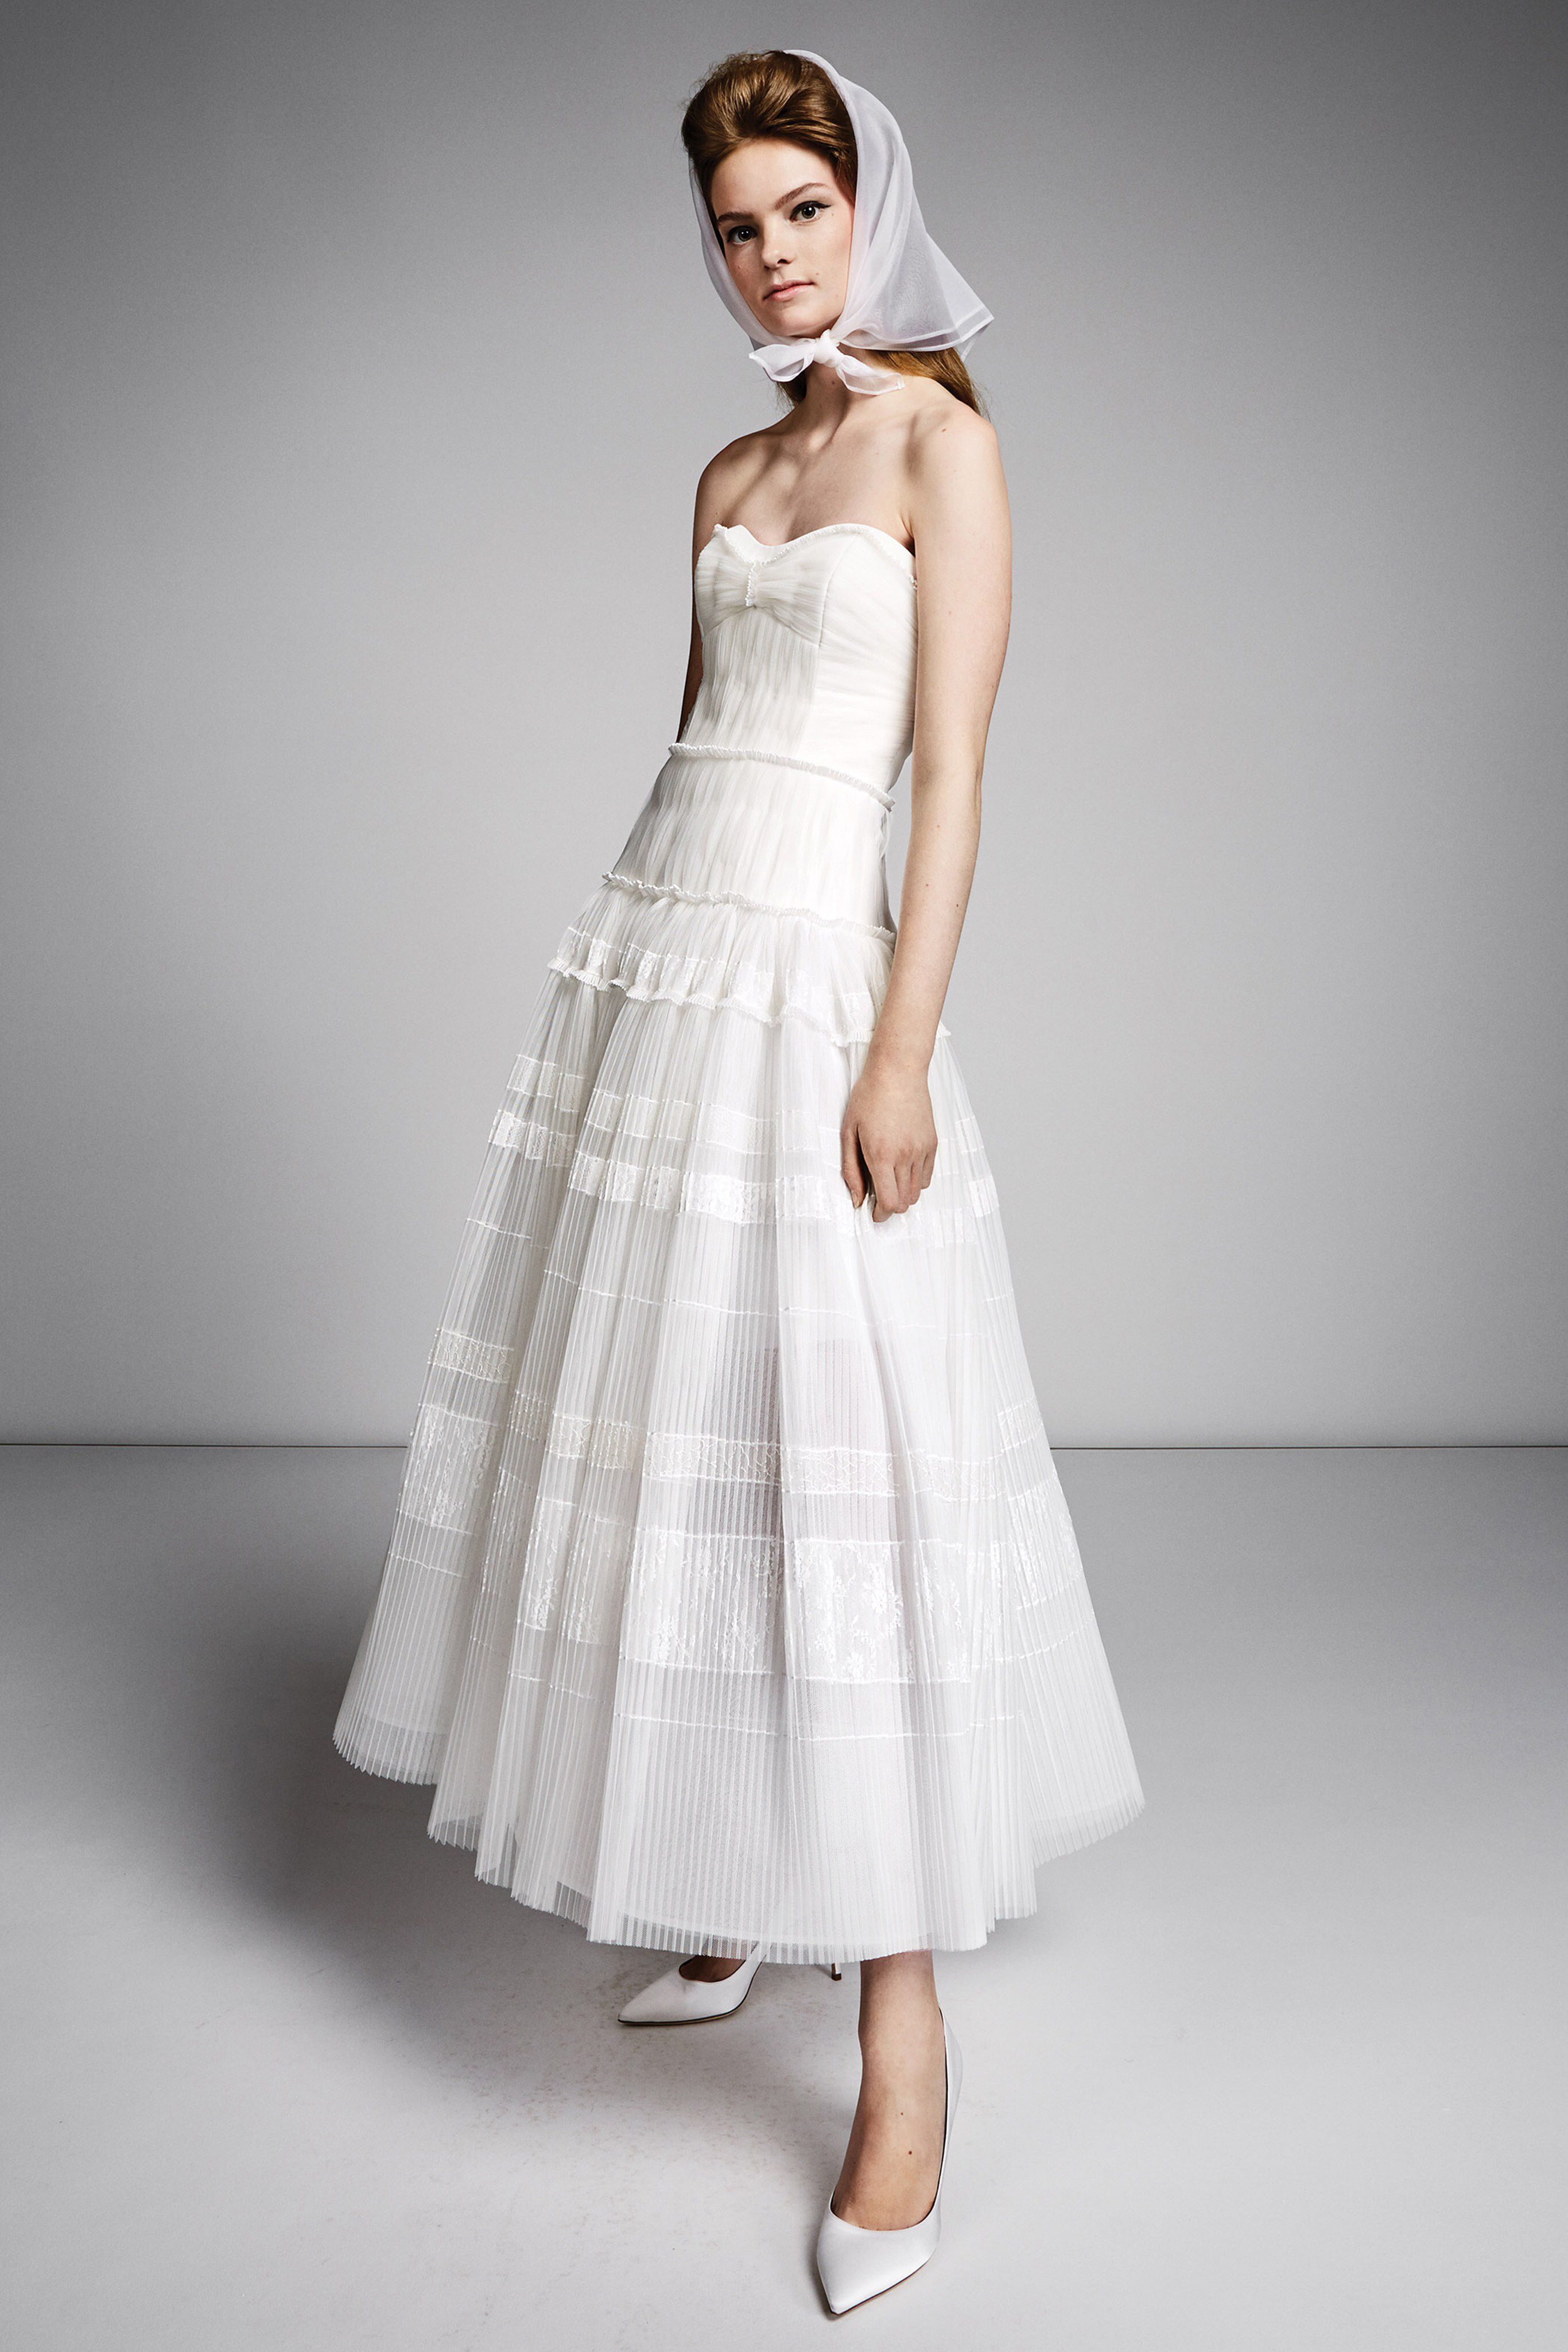 59caa62ebb13 Viktor   Rolf Fall 2019 Bridal Fashion Show Collection  See the complete  Viktor   Rolf Fall 2019 Bridal collection. Look 15